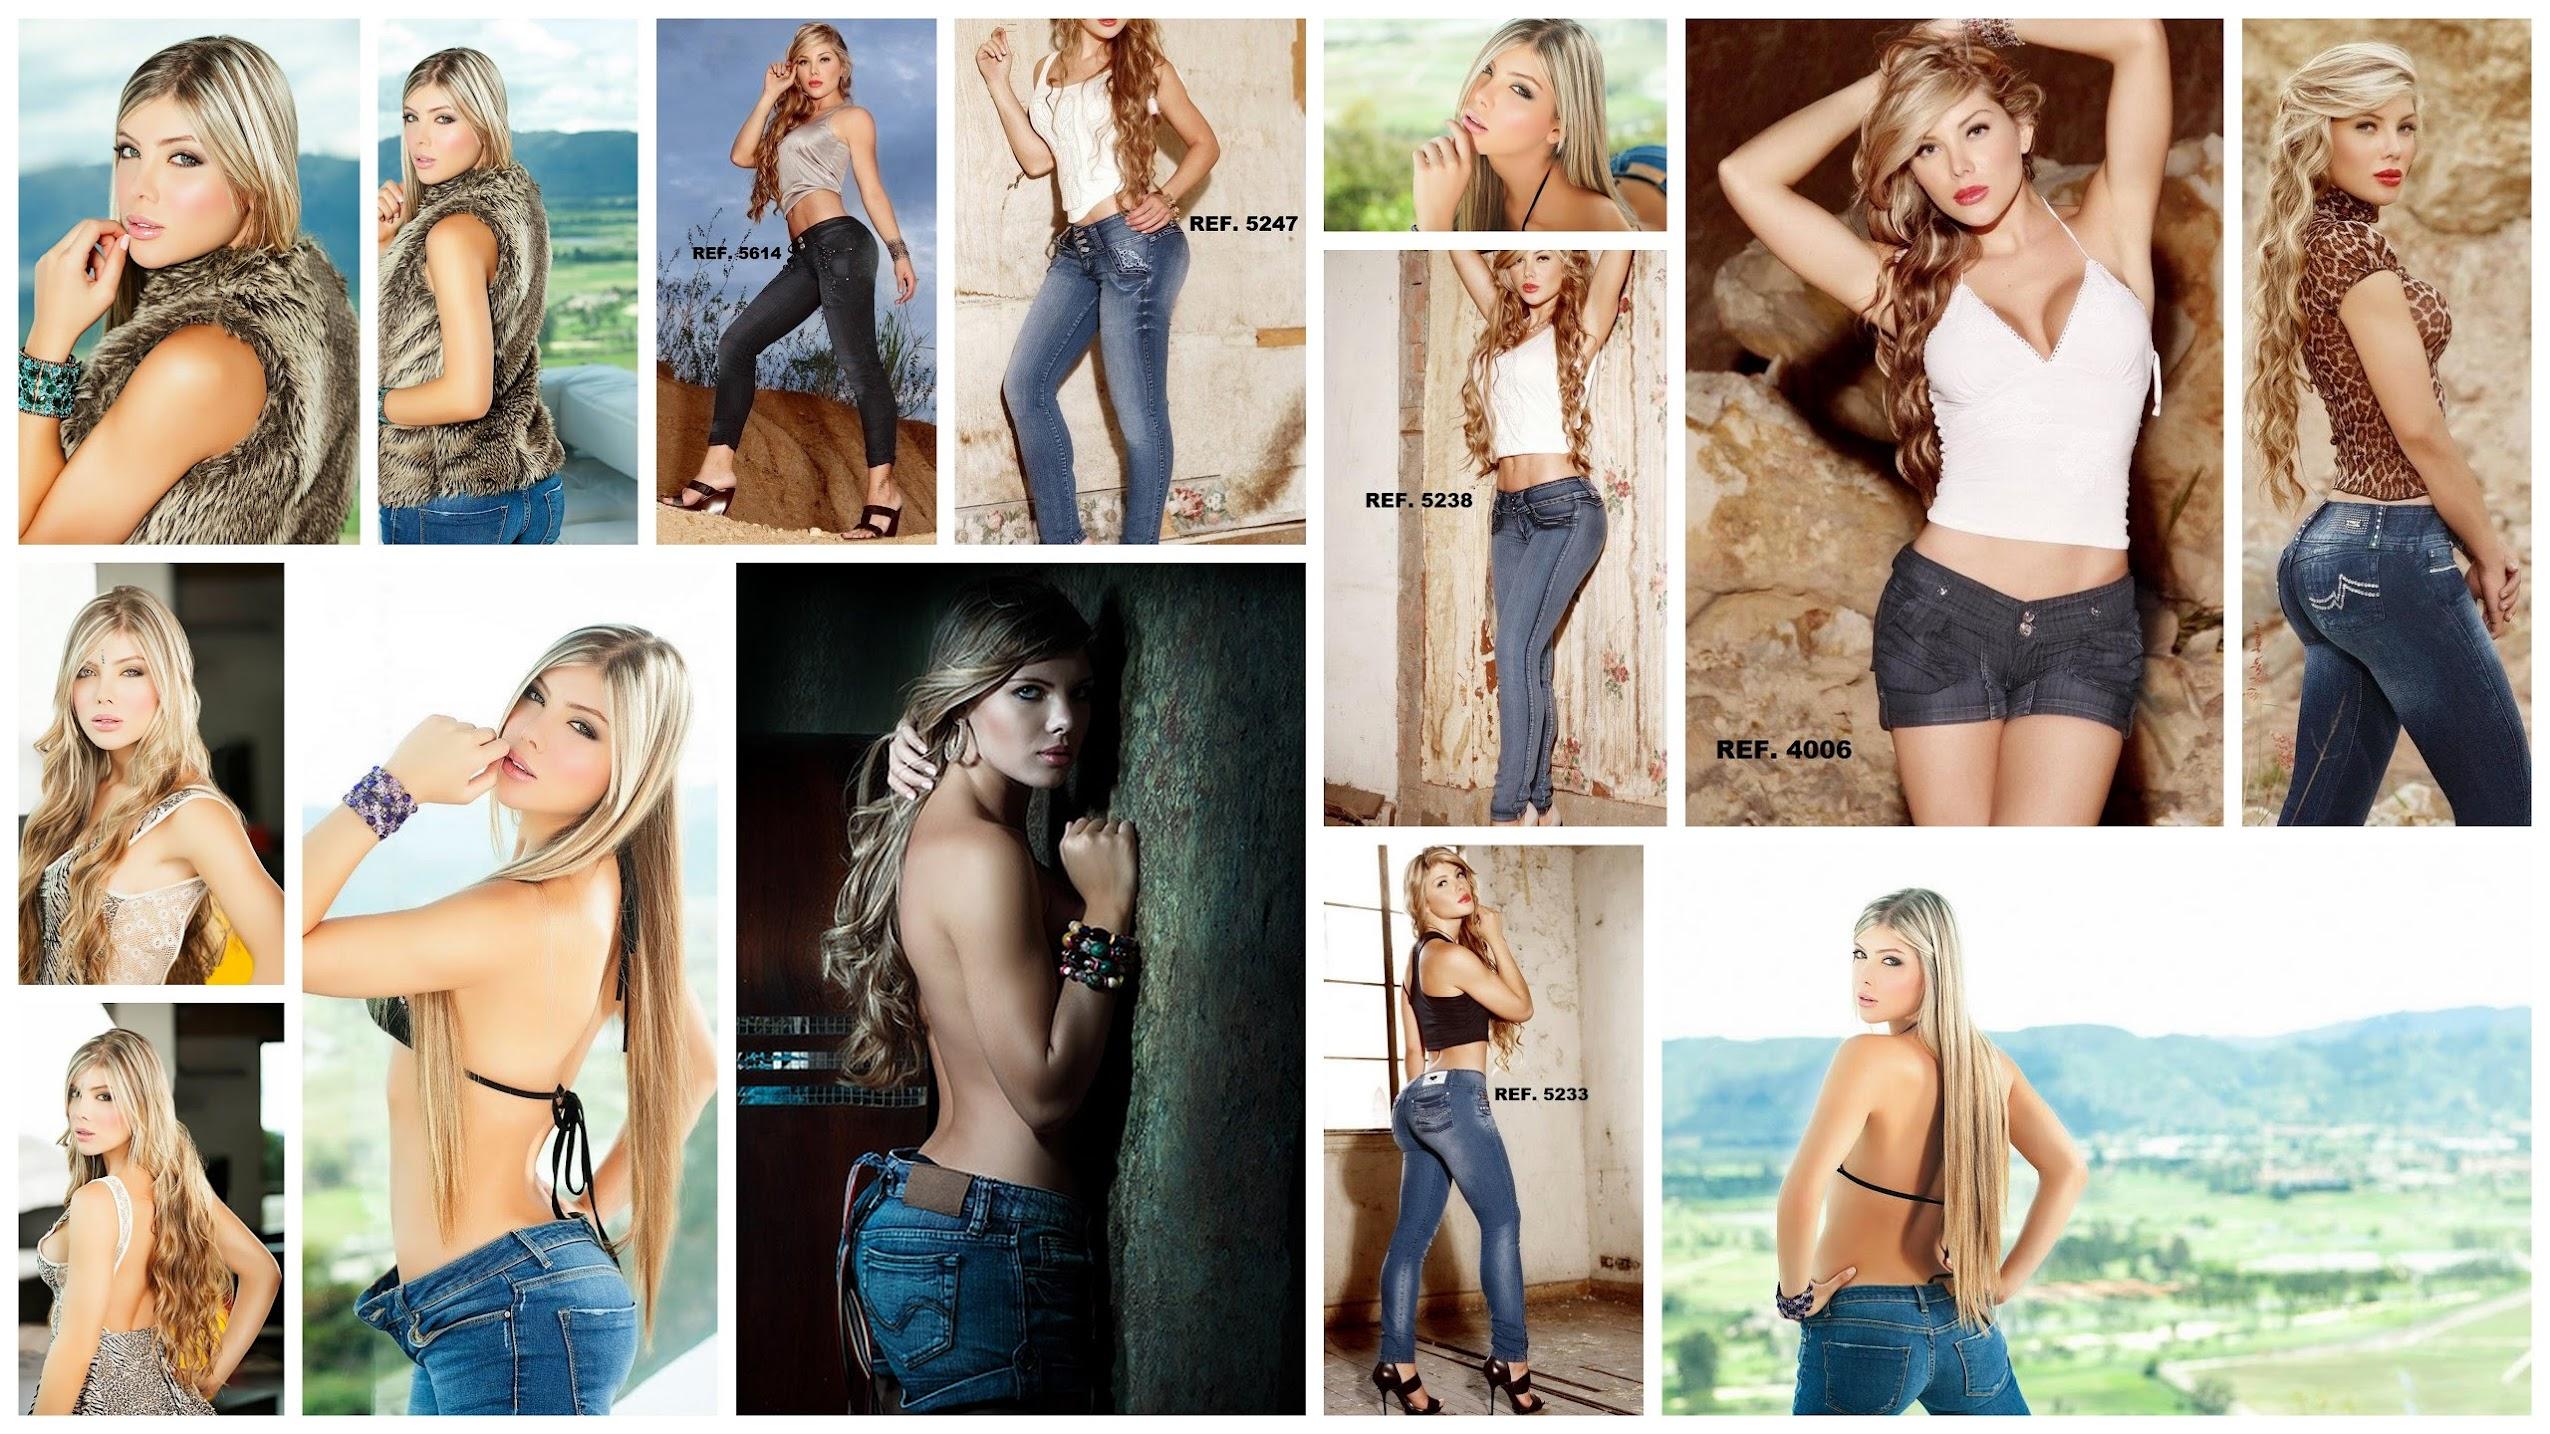 Modelando Sexy Jeans, Imágenes De Sofia Jaramillo Foto 1